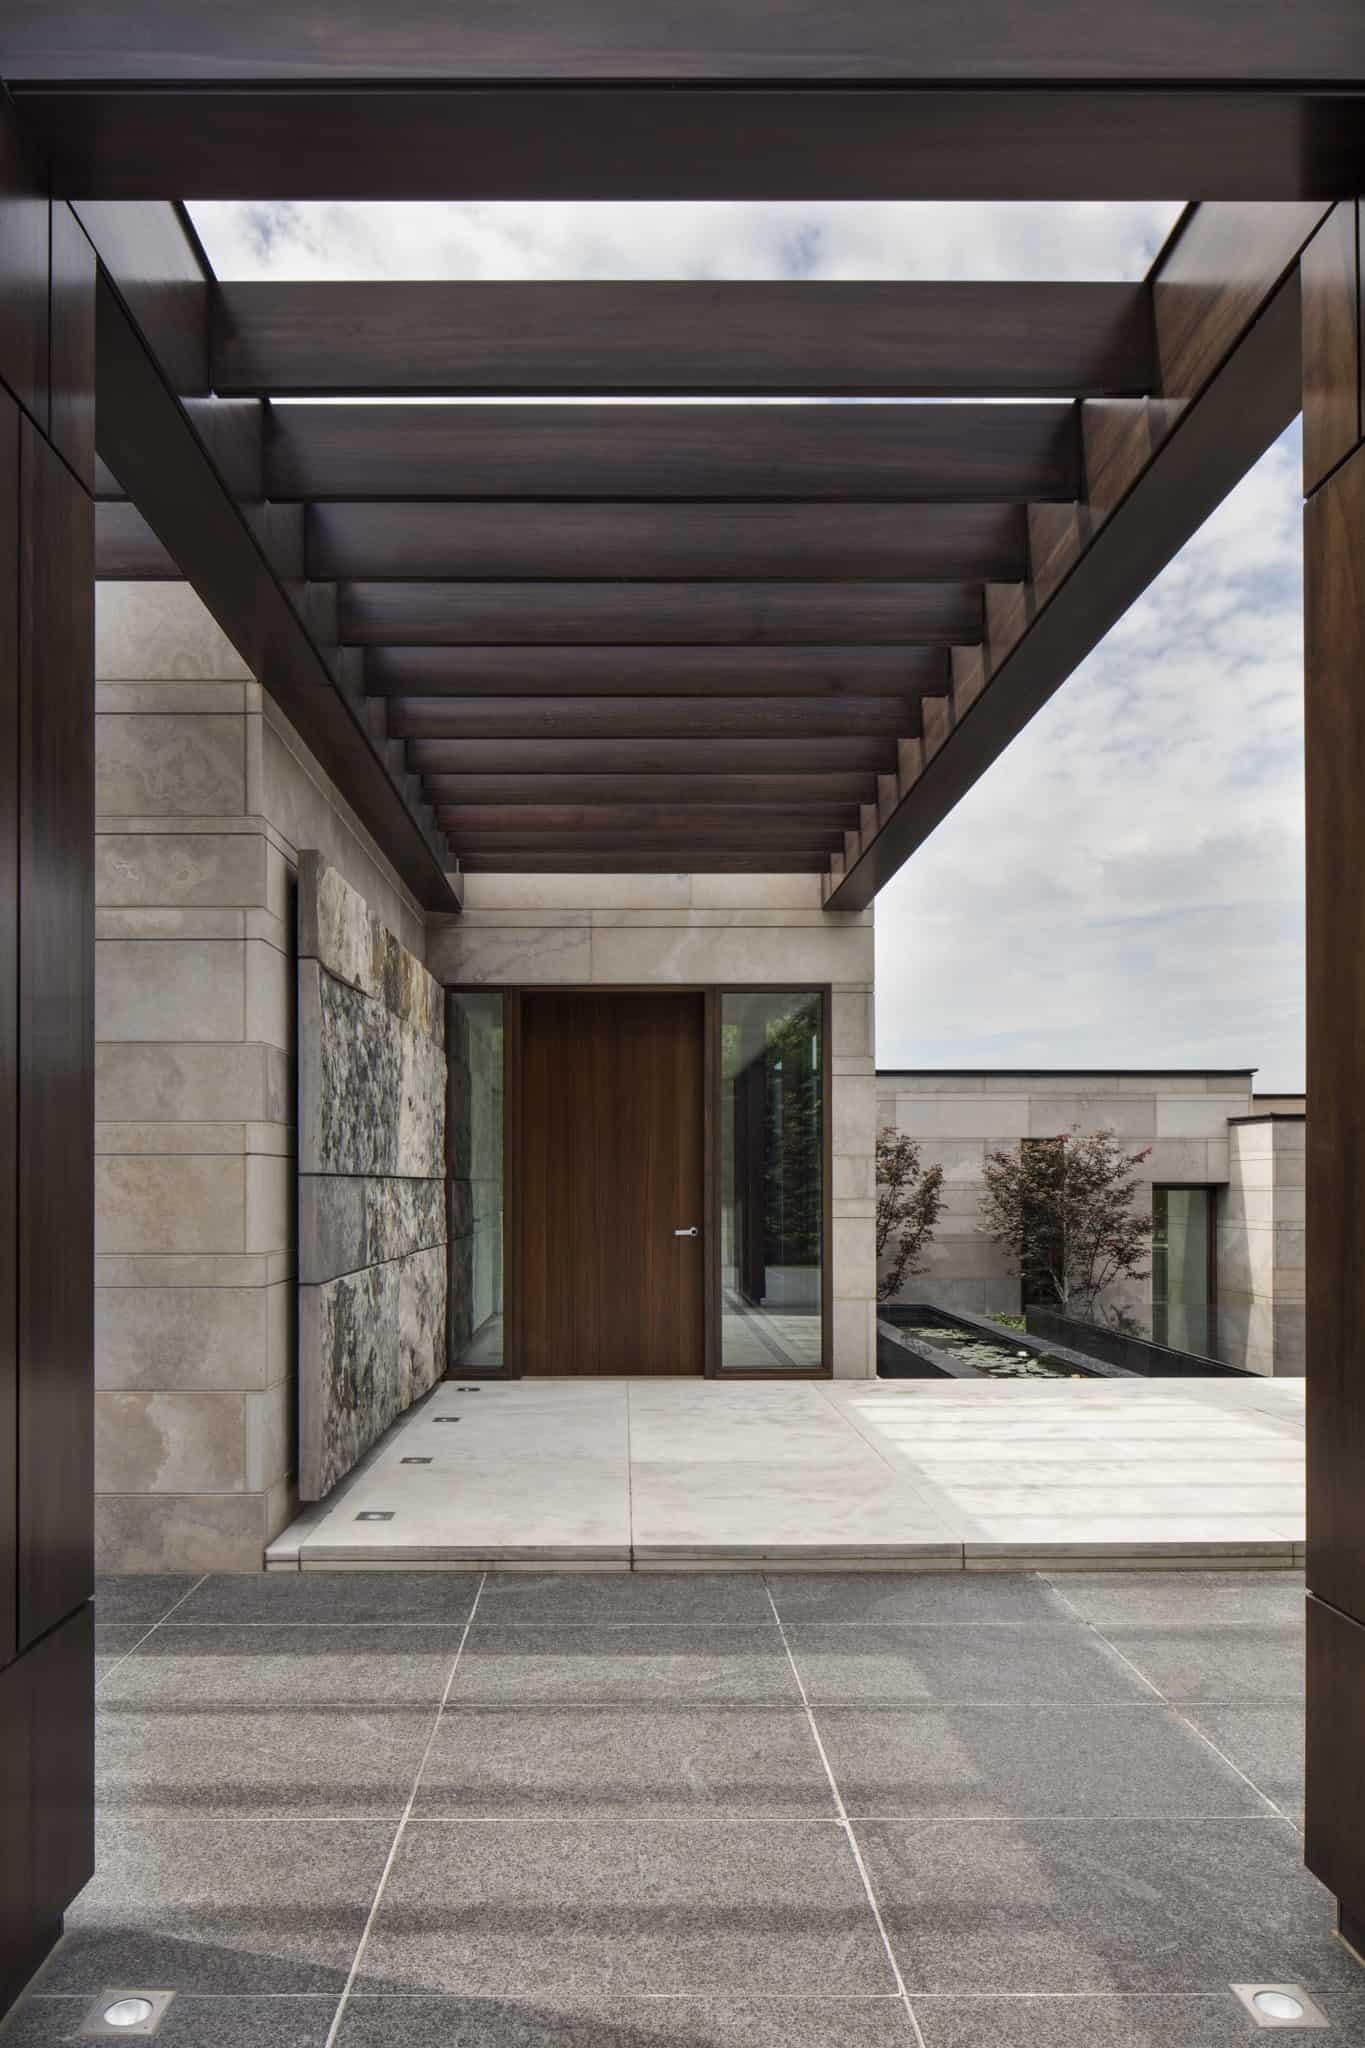 Studio Munge_Private Residence_01_Adrien Williams_web